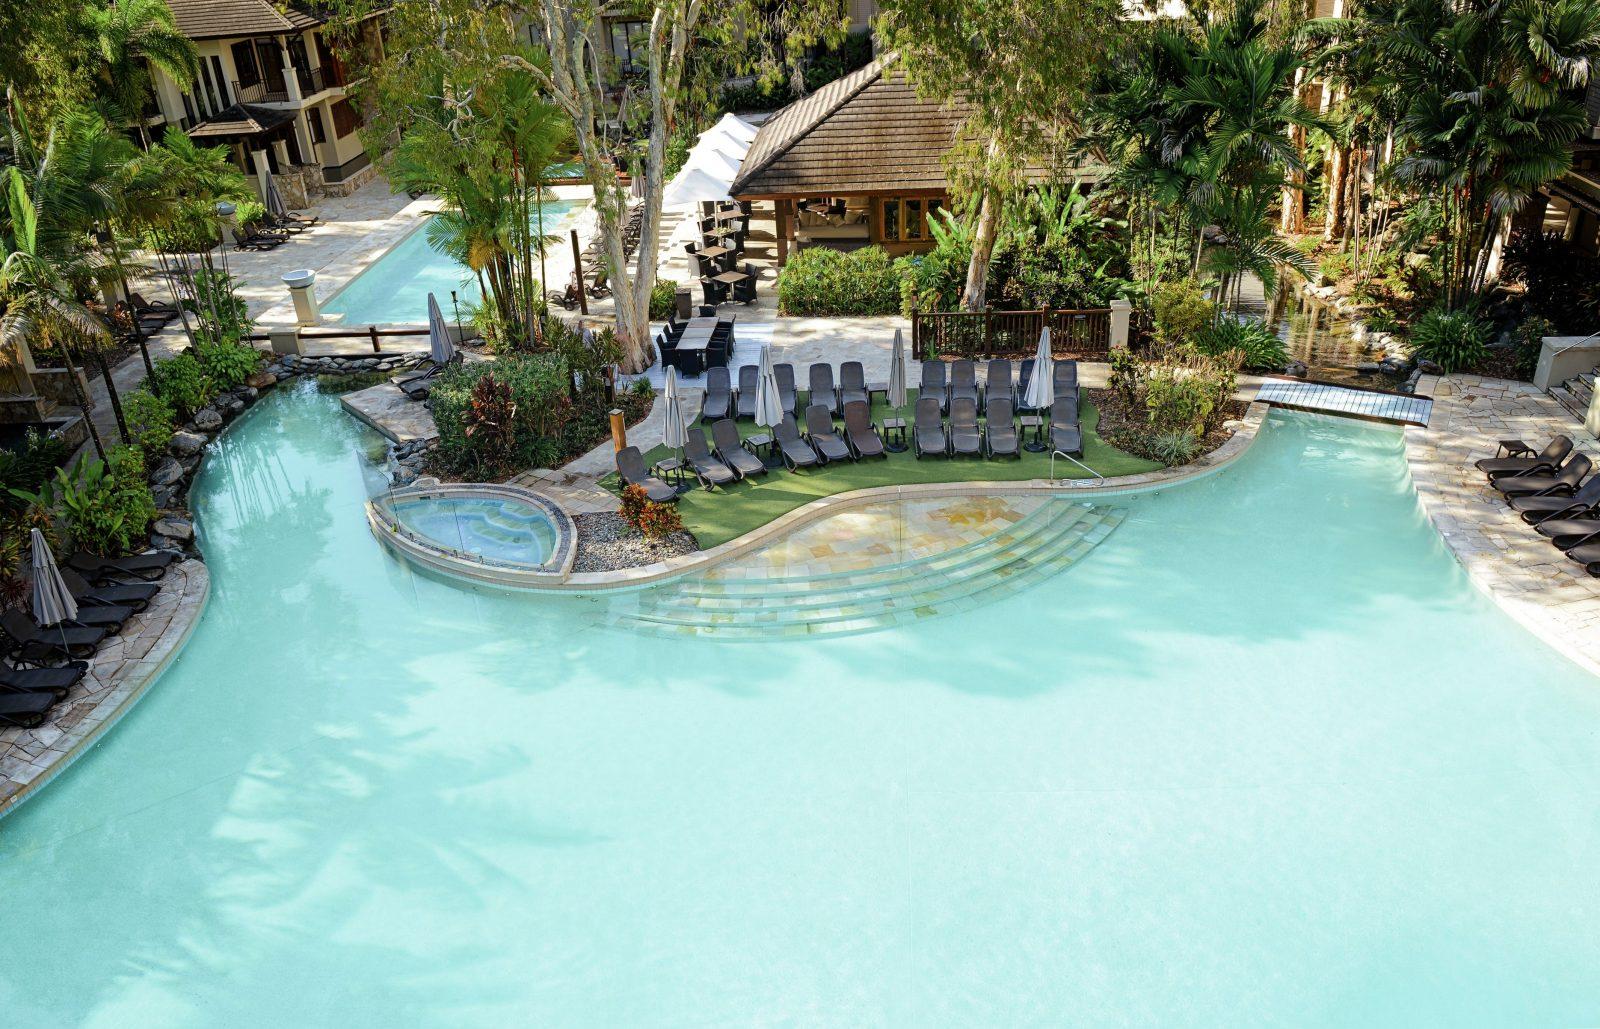 Pullman Palm Cove